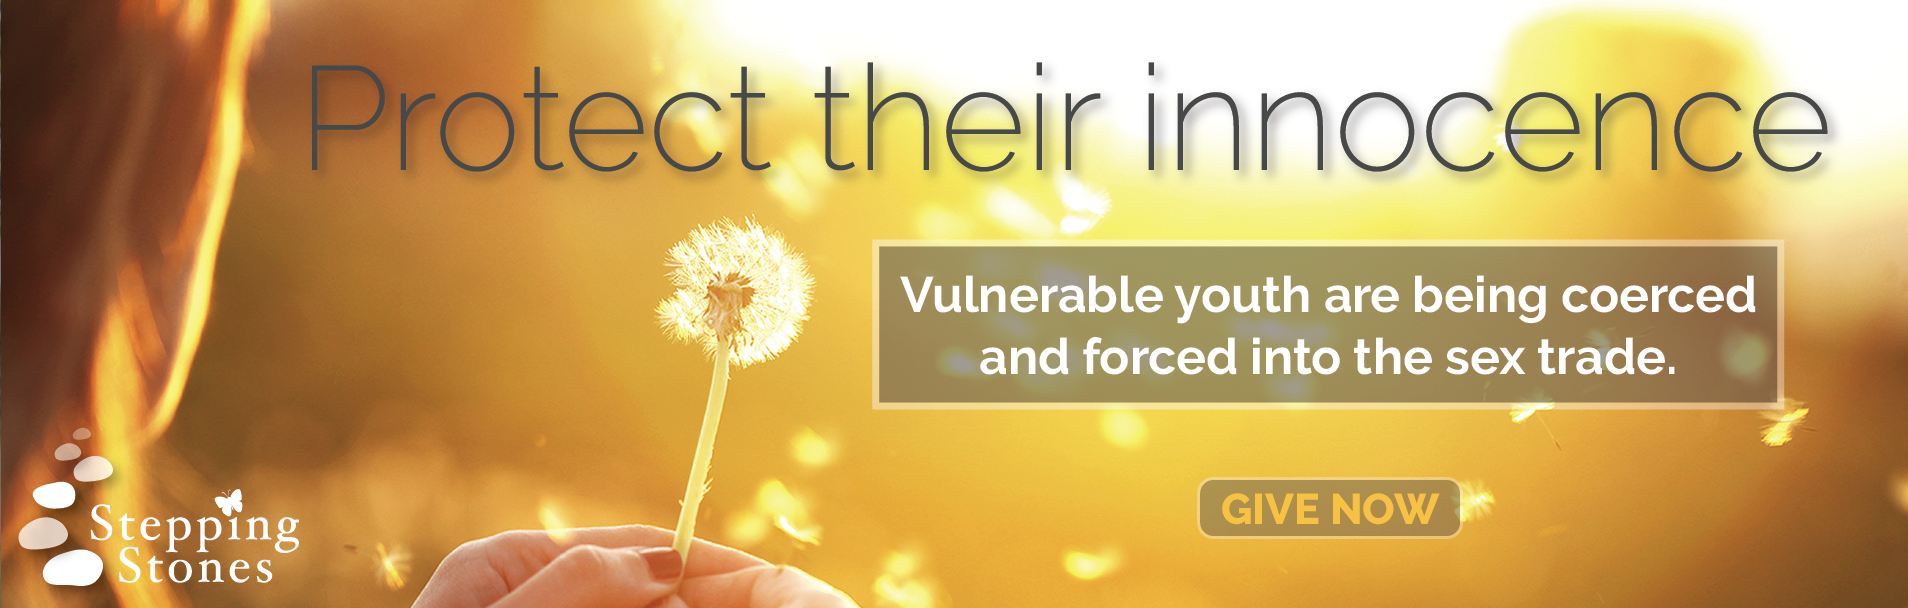 Protect Their Innocence